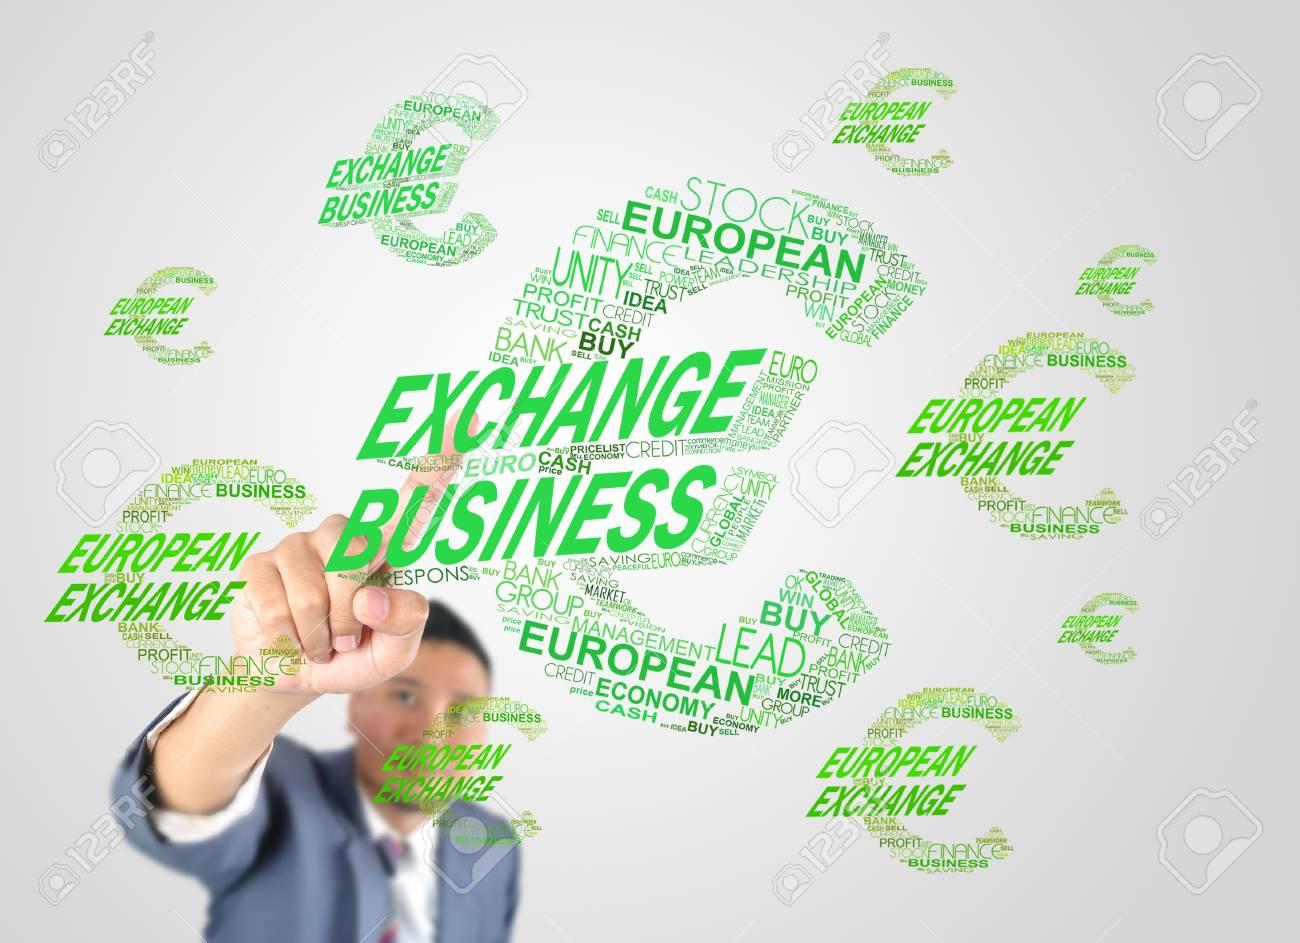 Business man designed euro money icon by crossword Stock Photo - 17846796